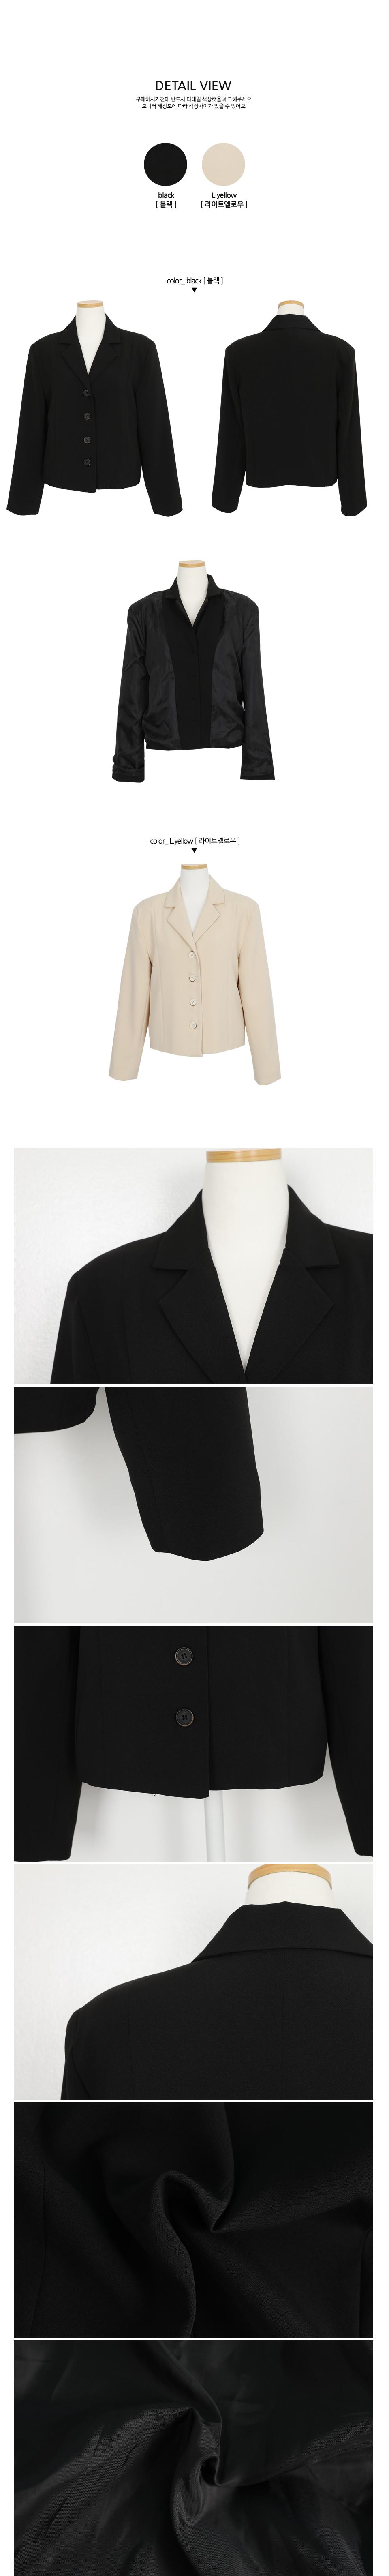 Panini jacket